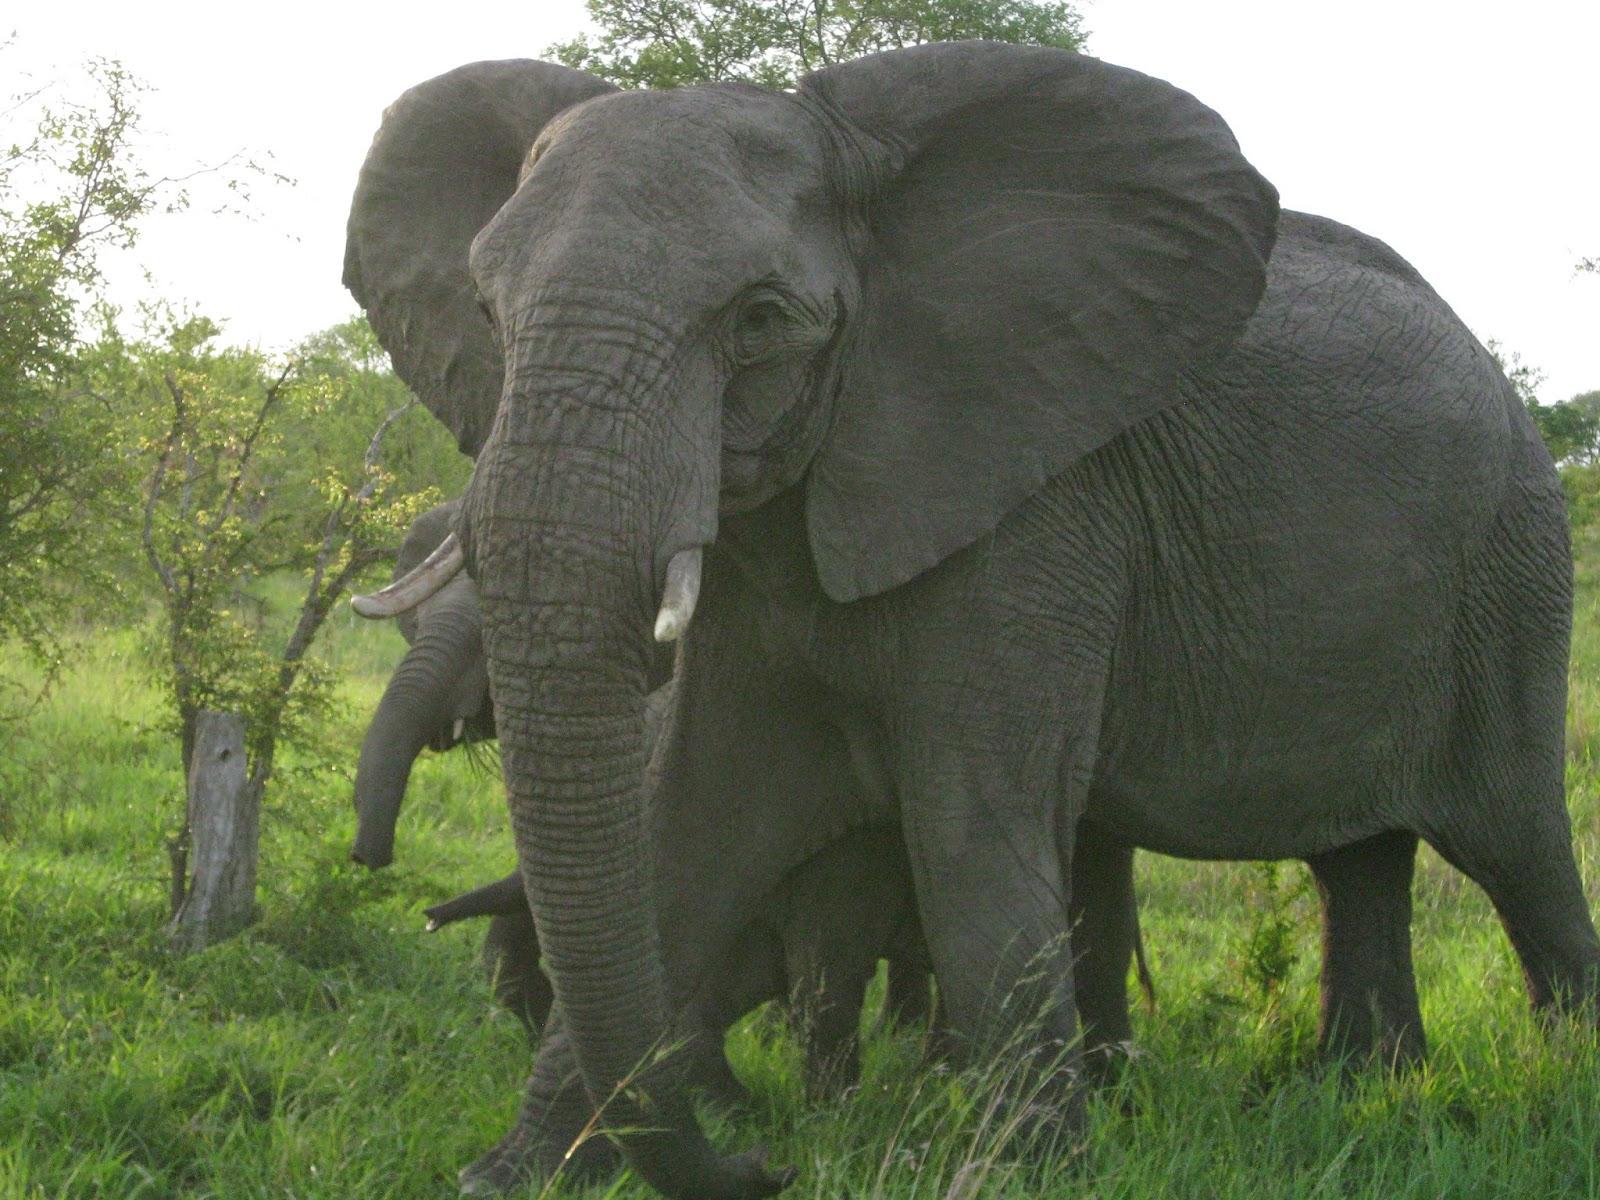 Sabi Sands - The bull elephant moves toward us so we drive off